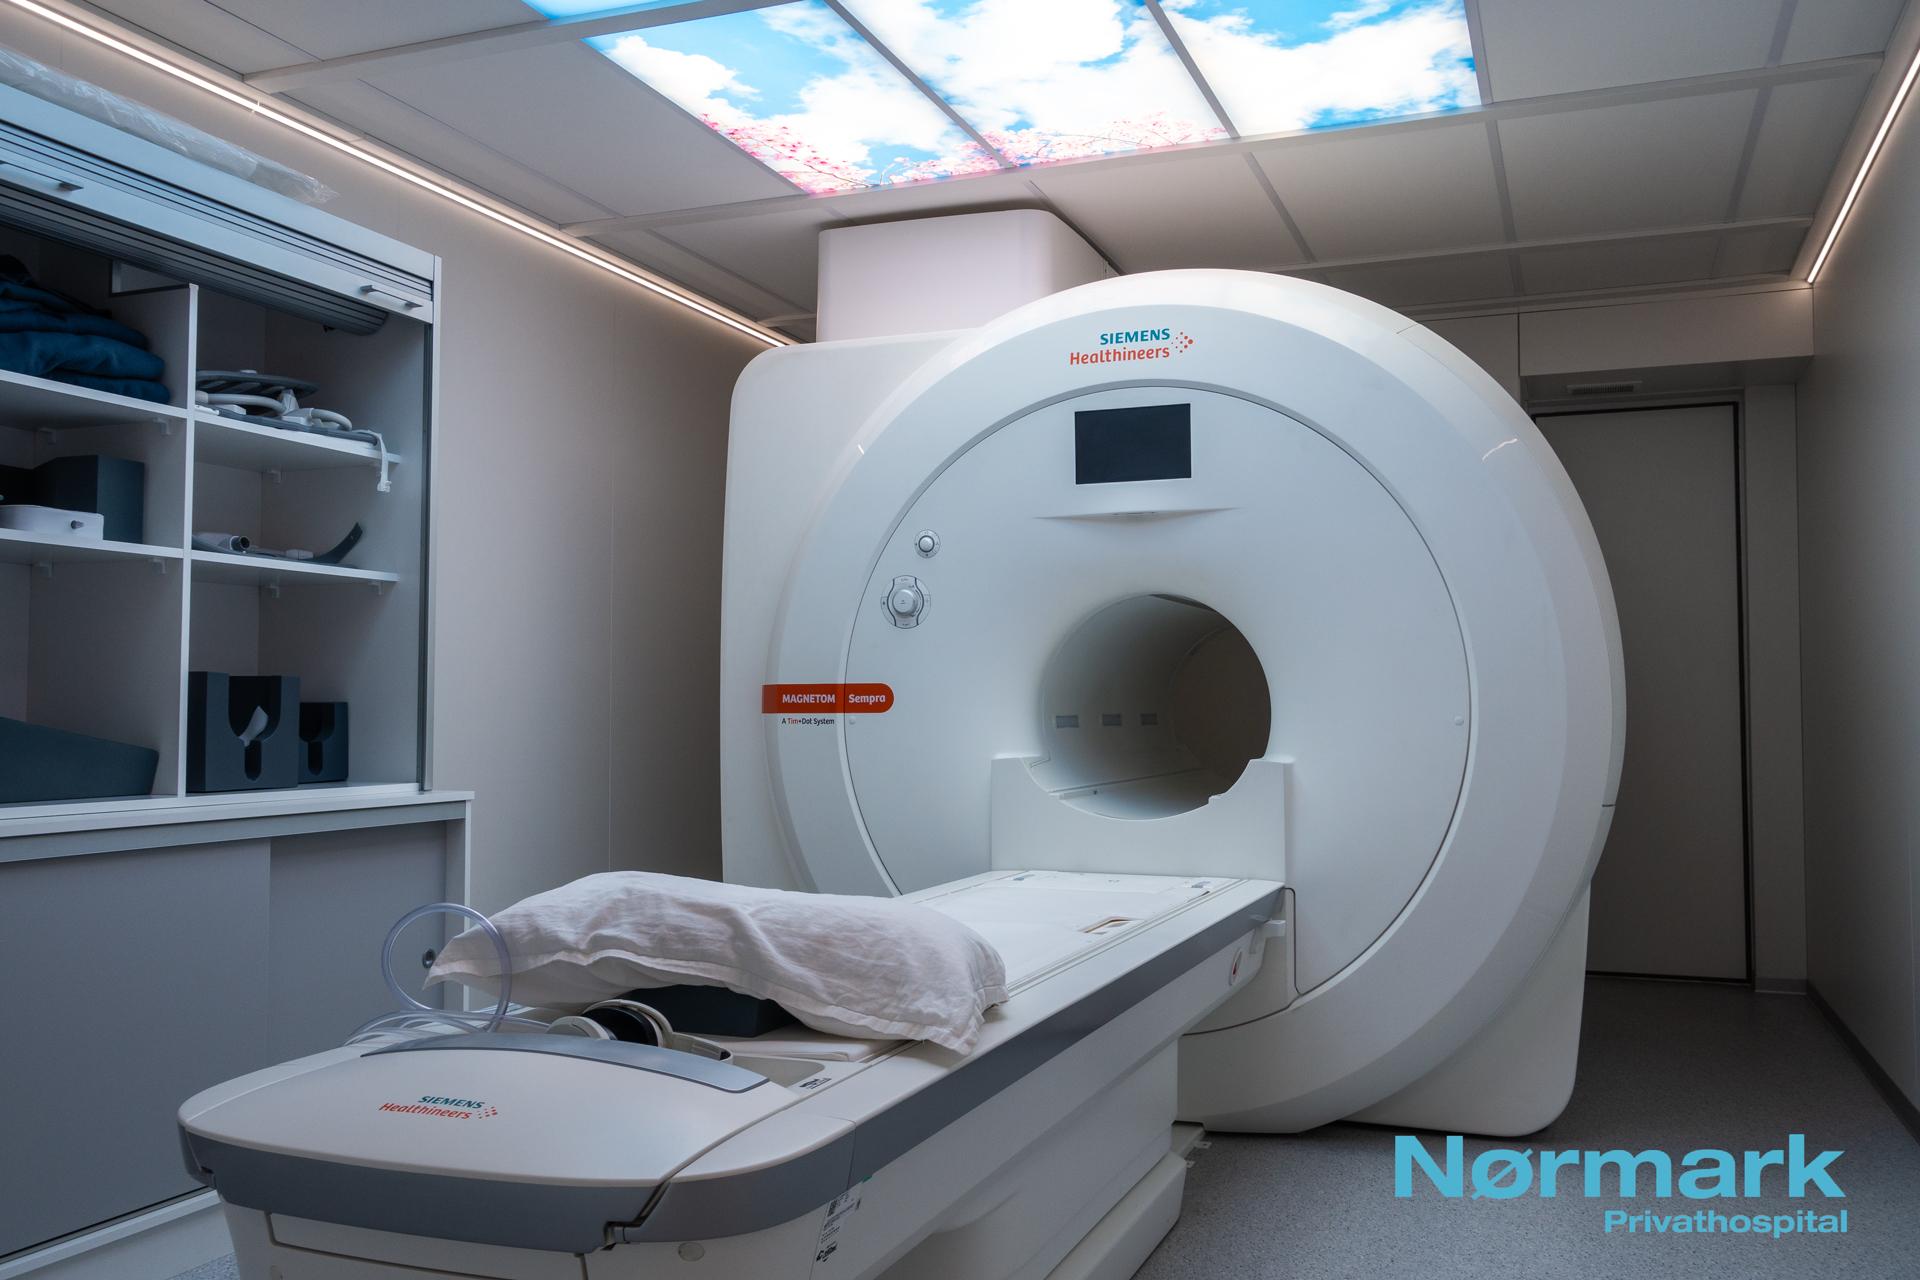 MR Scanner Siemens Skanner Privathospital